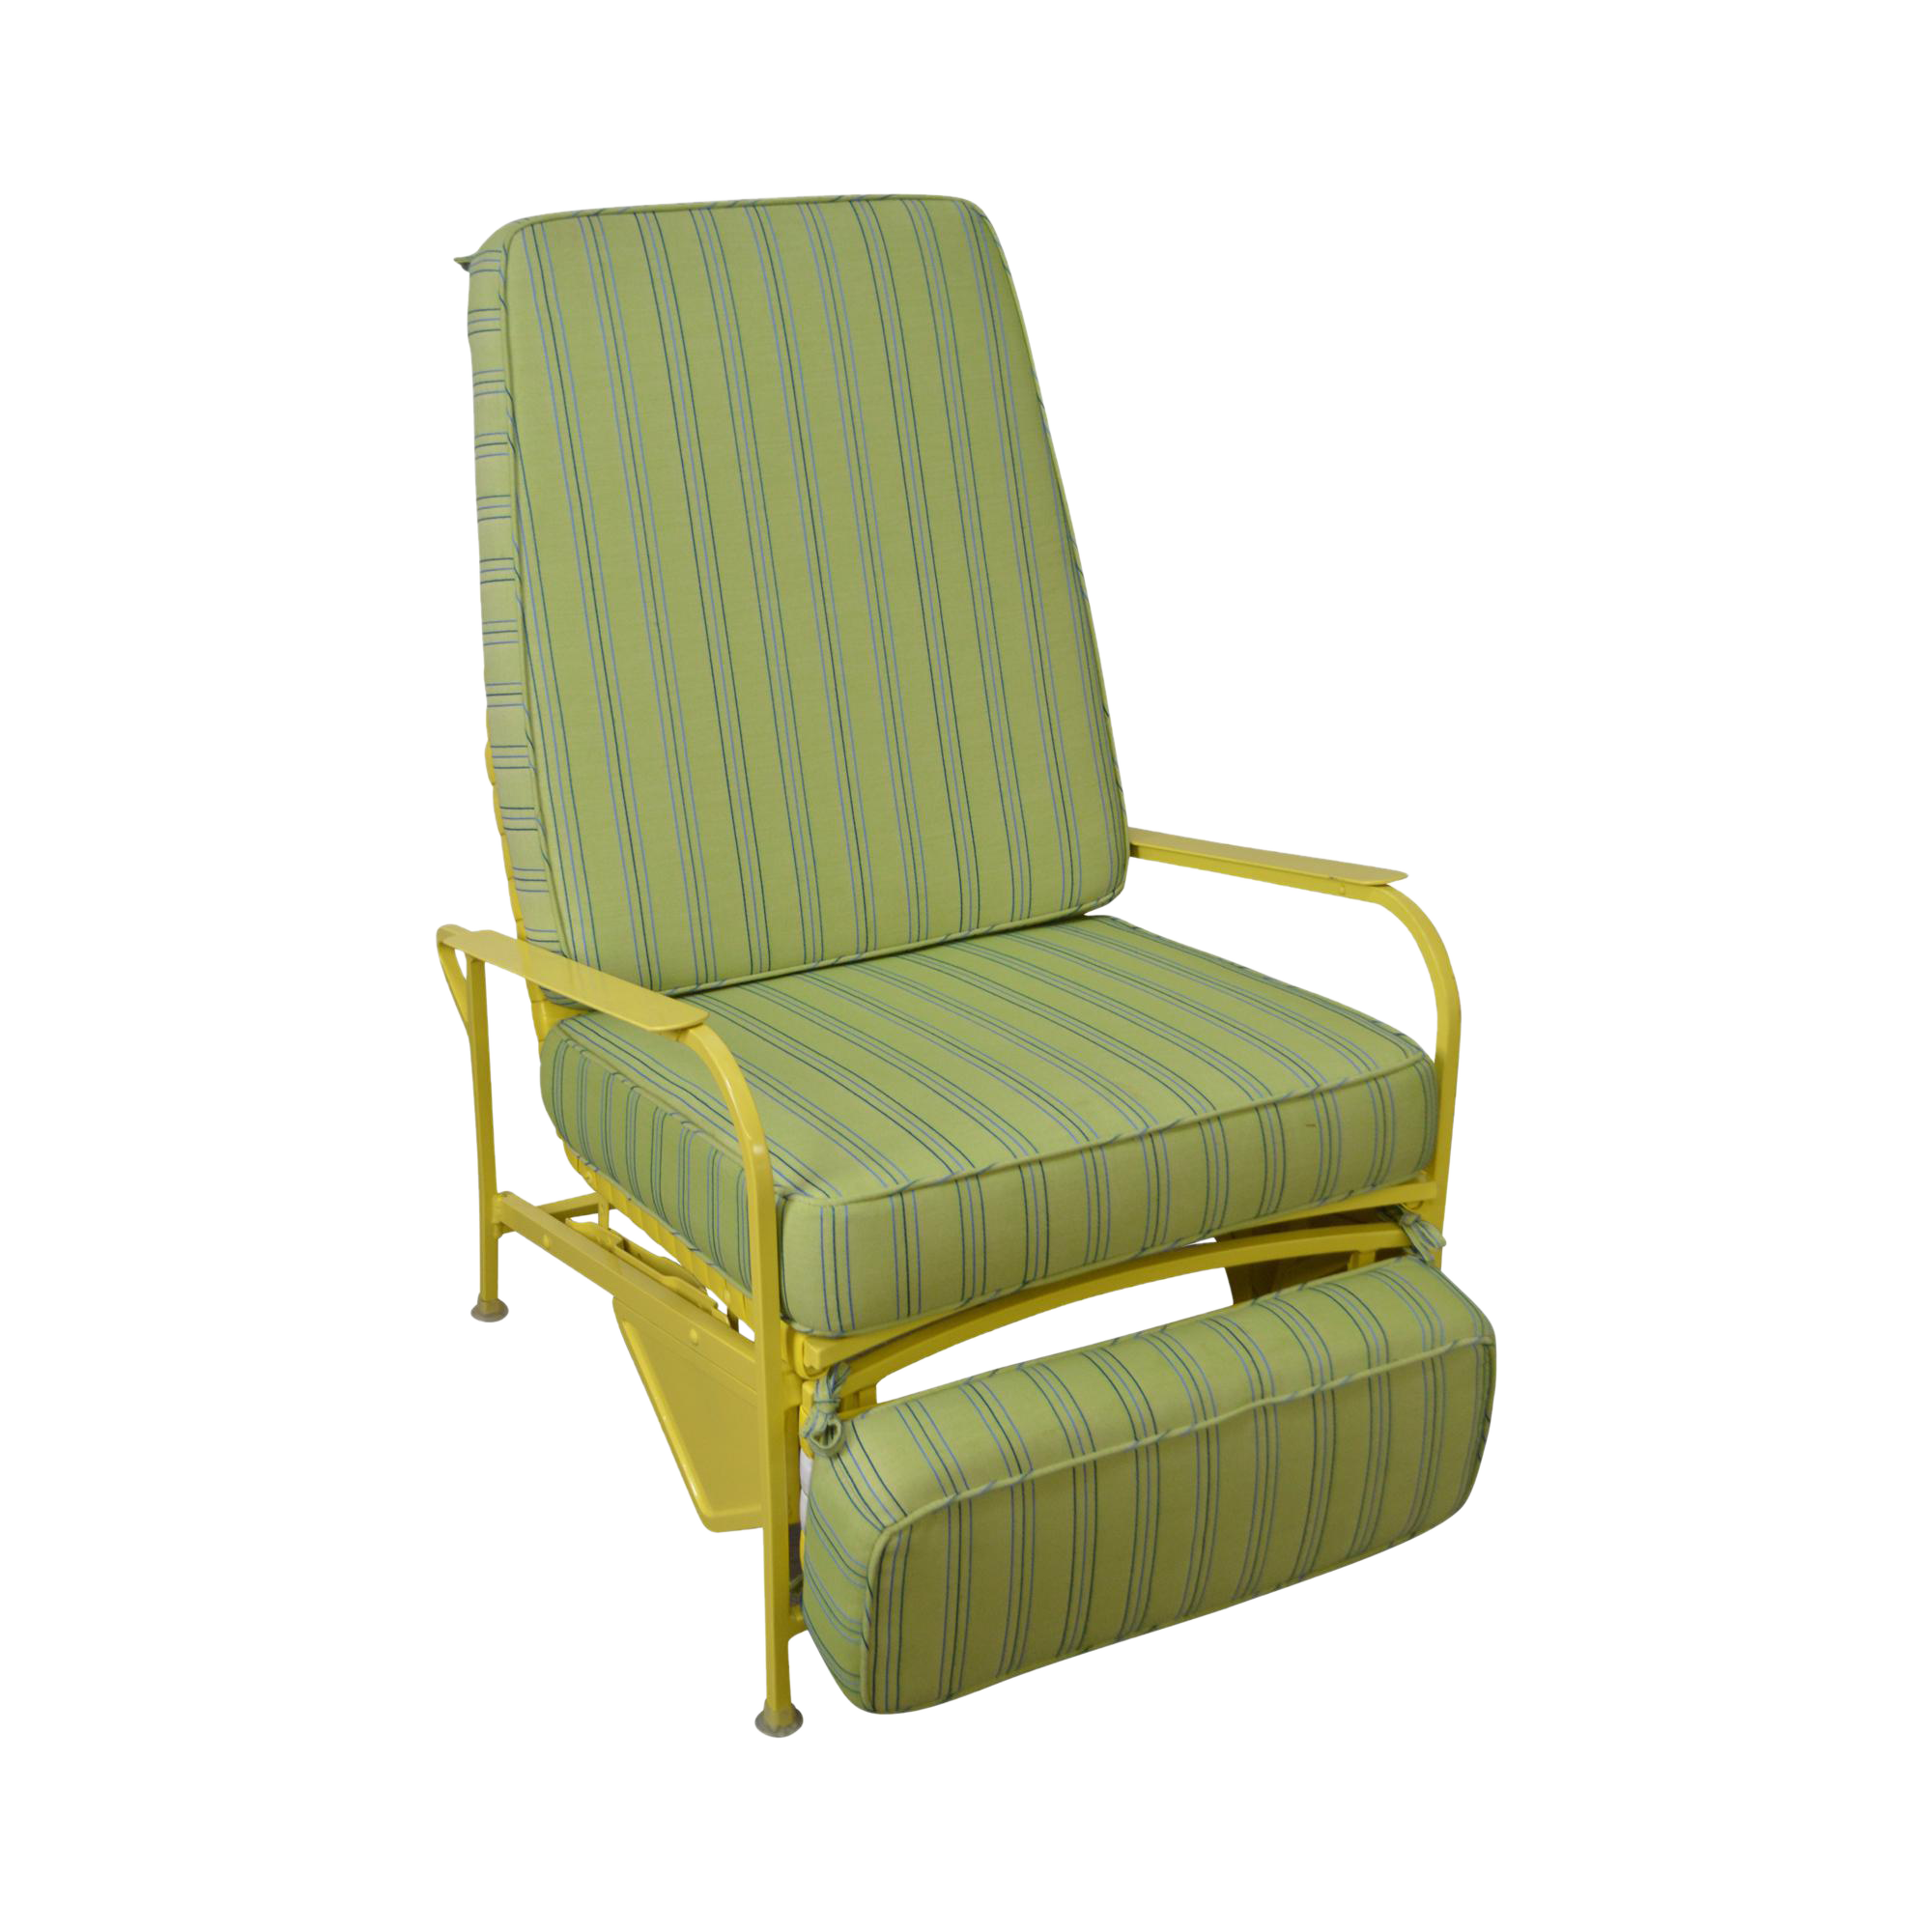 lounge wicker recliner s luxuri com chair loungemobel sofa luxurios set outdoor design amazing patio fresh chelseapinedainteriors gallery